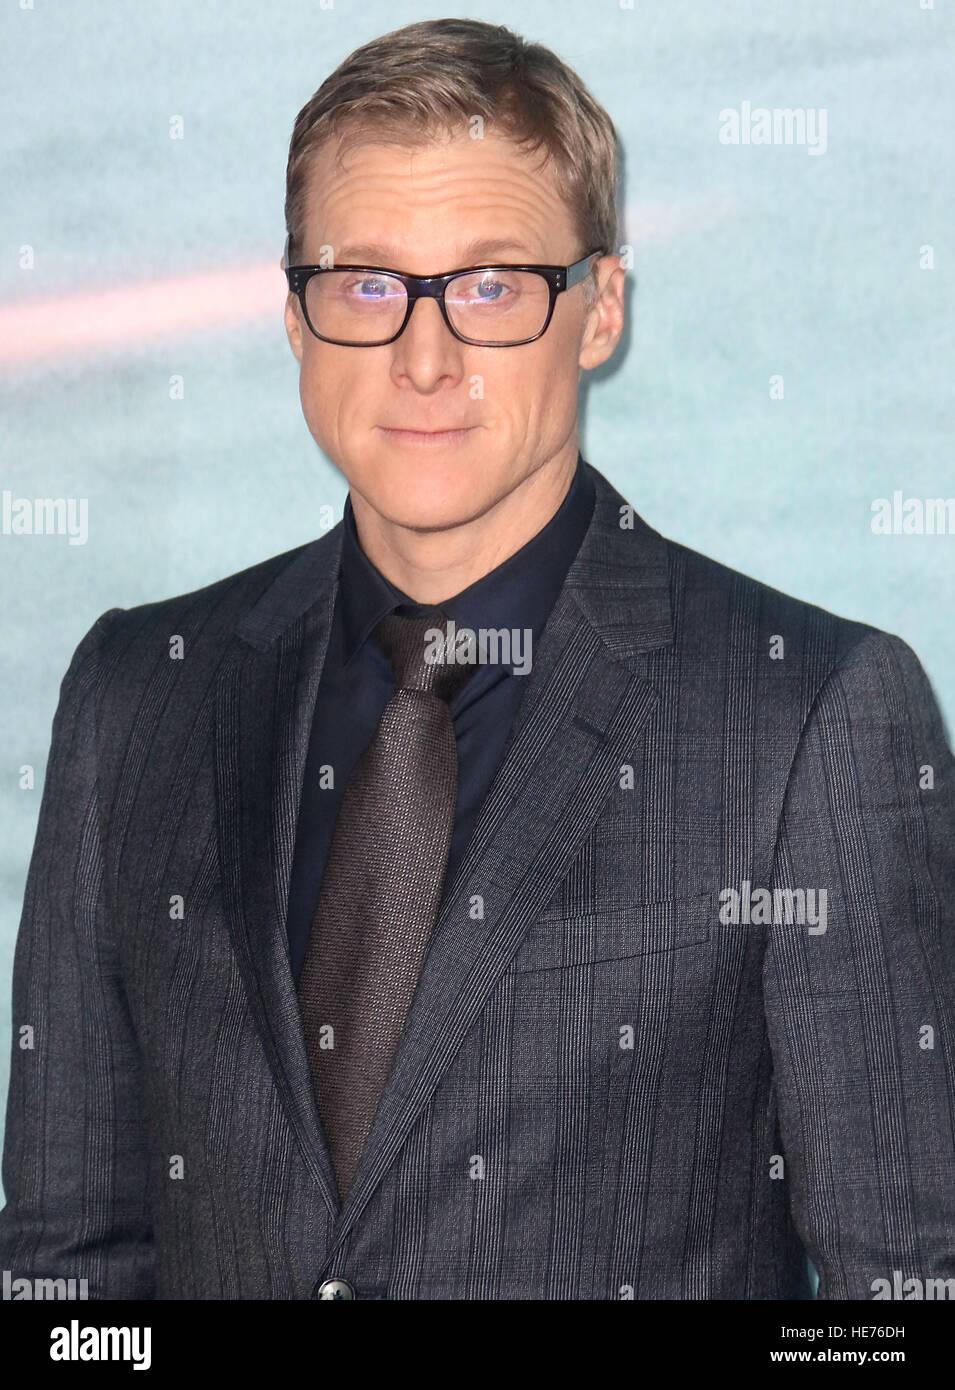 "13. Dezember 2016 - Alan Tudyk Teilnahme an ""ein Schelm: A Star Wars Story""-Launch Event in der Tate Modern Stockbild"